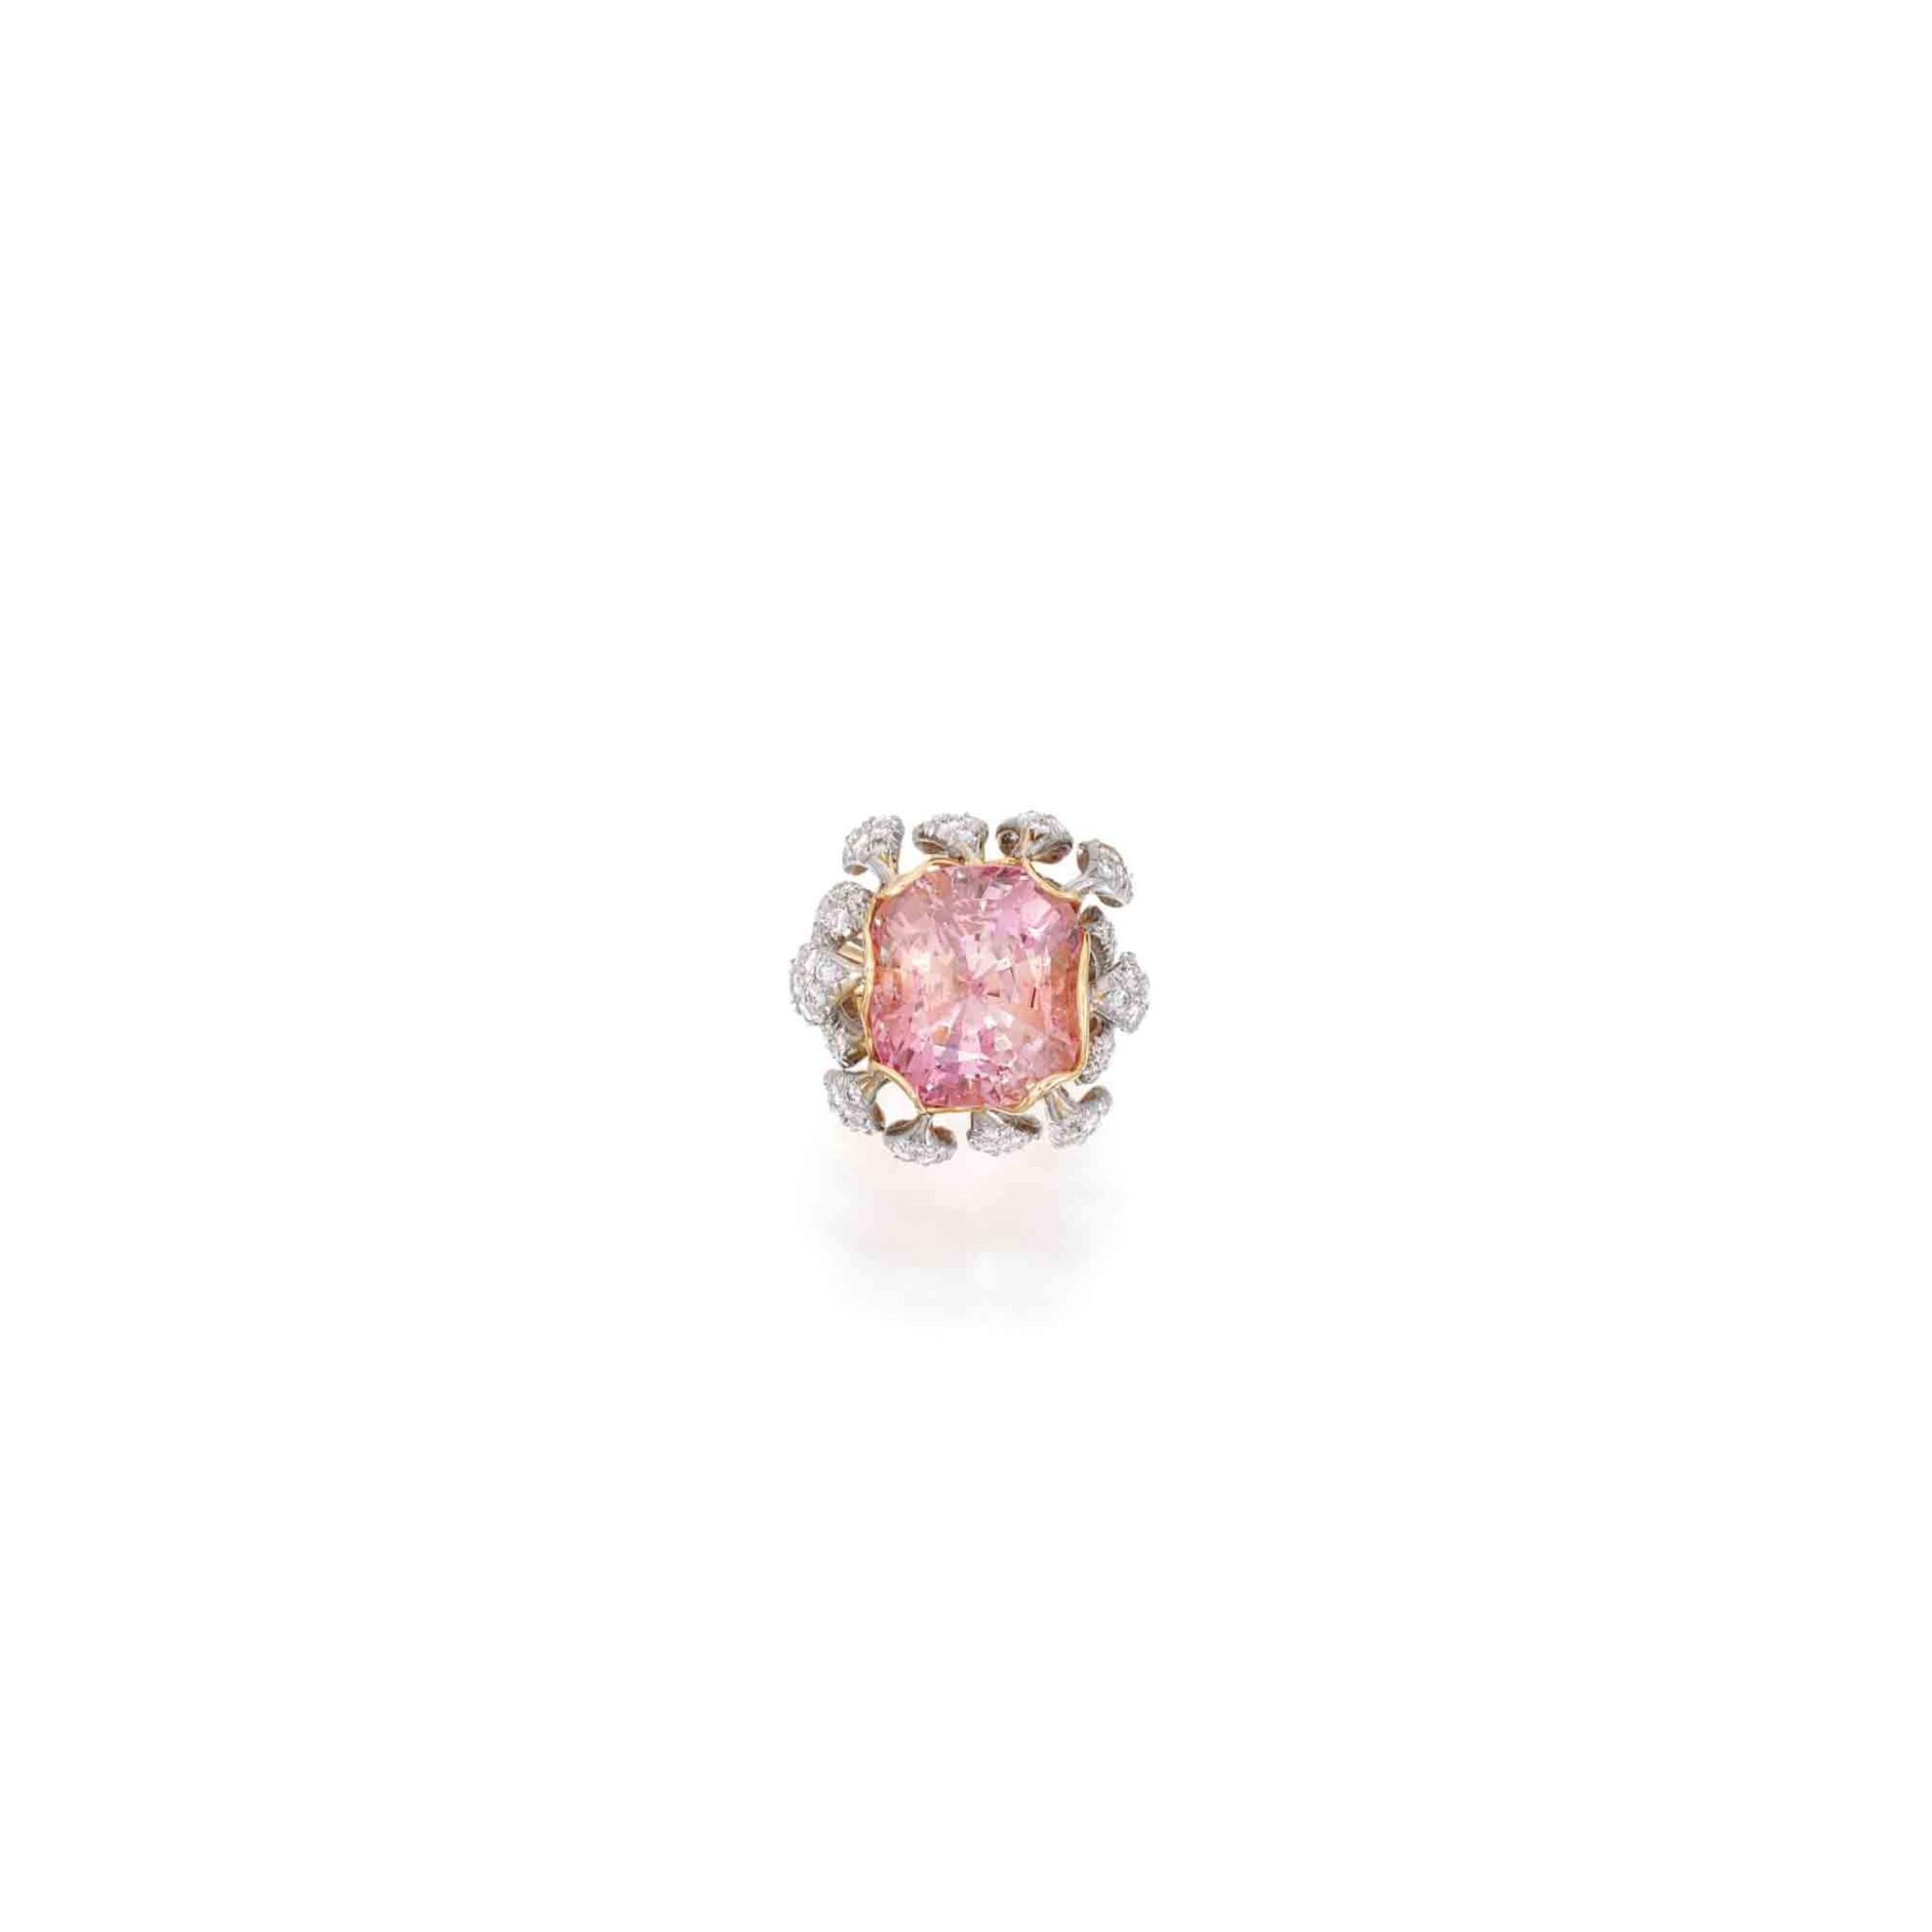 View full screen - View 1 of Lot 191. Padparadscha Sapphire and Diamond Ring [橙粉紅色剛玉配鑽石戒指].